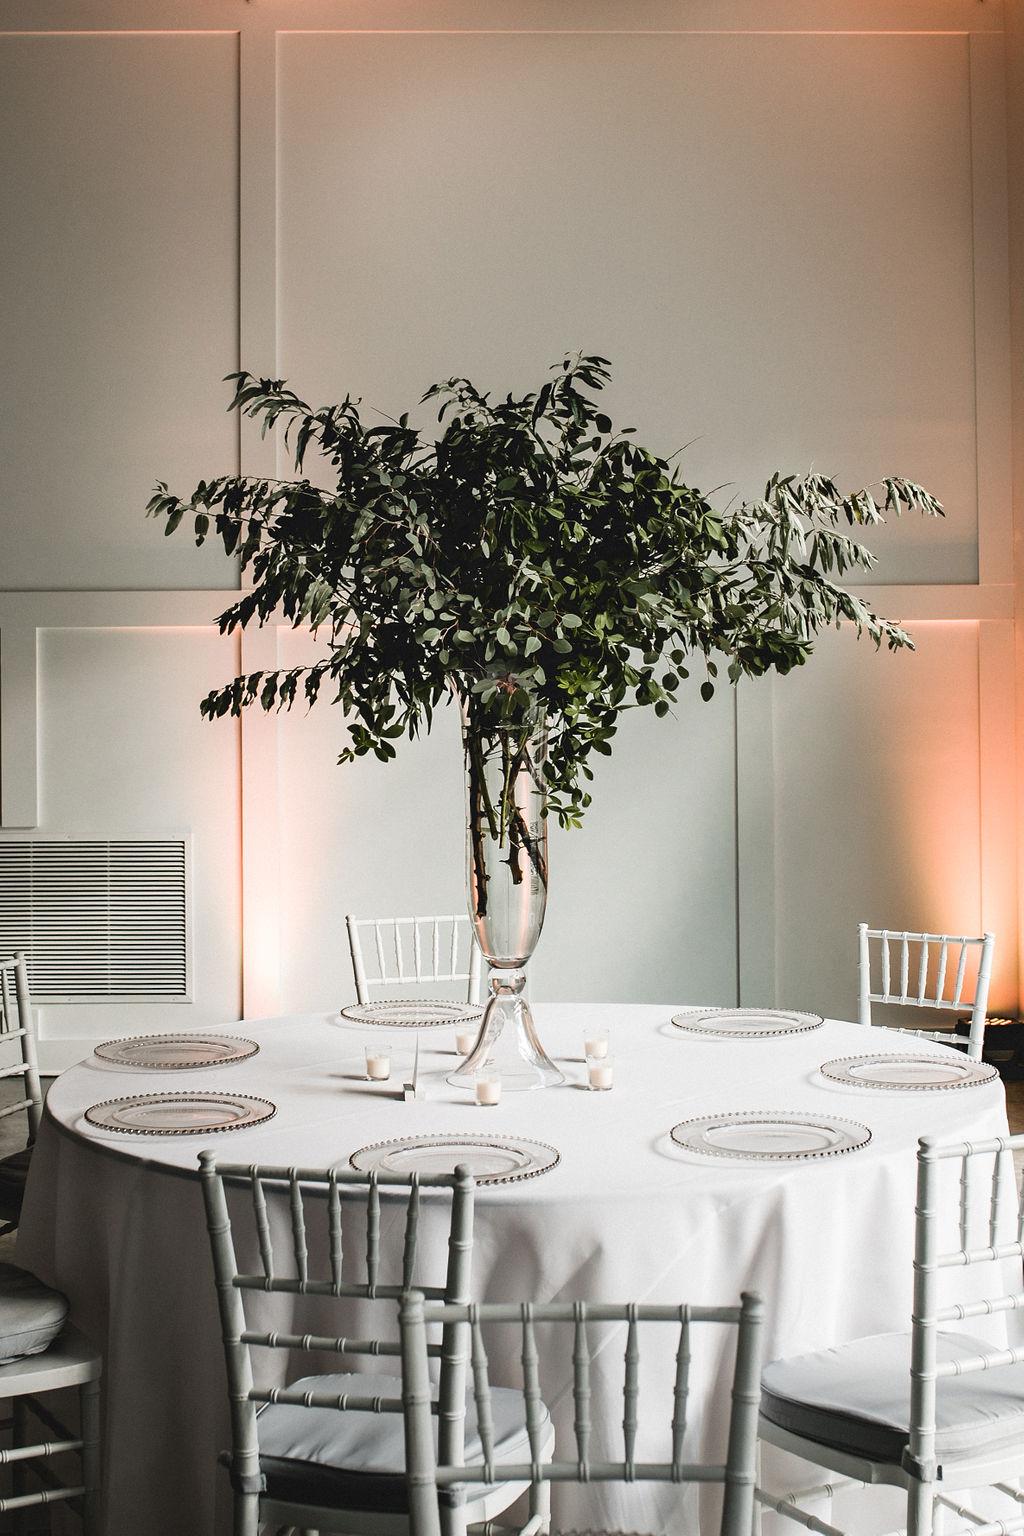 Kelly and Matt | Hutton House | Aqua Fox Photography | Sixpence Events and Planning Minnesota Wedding Planner73.jpg